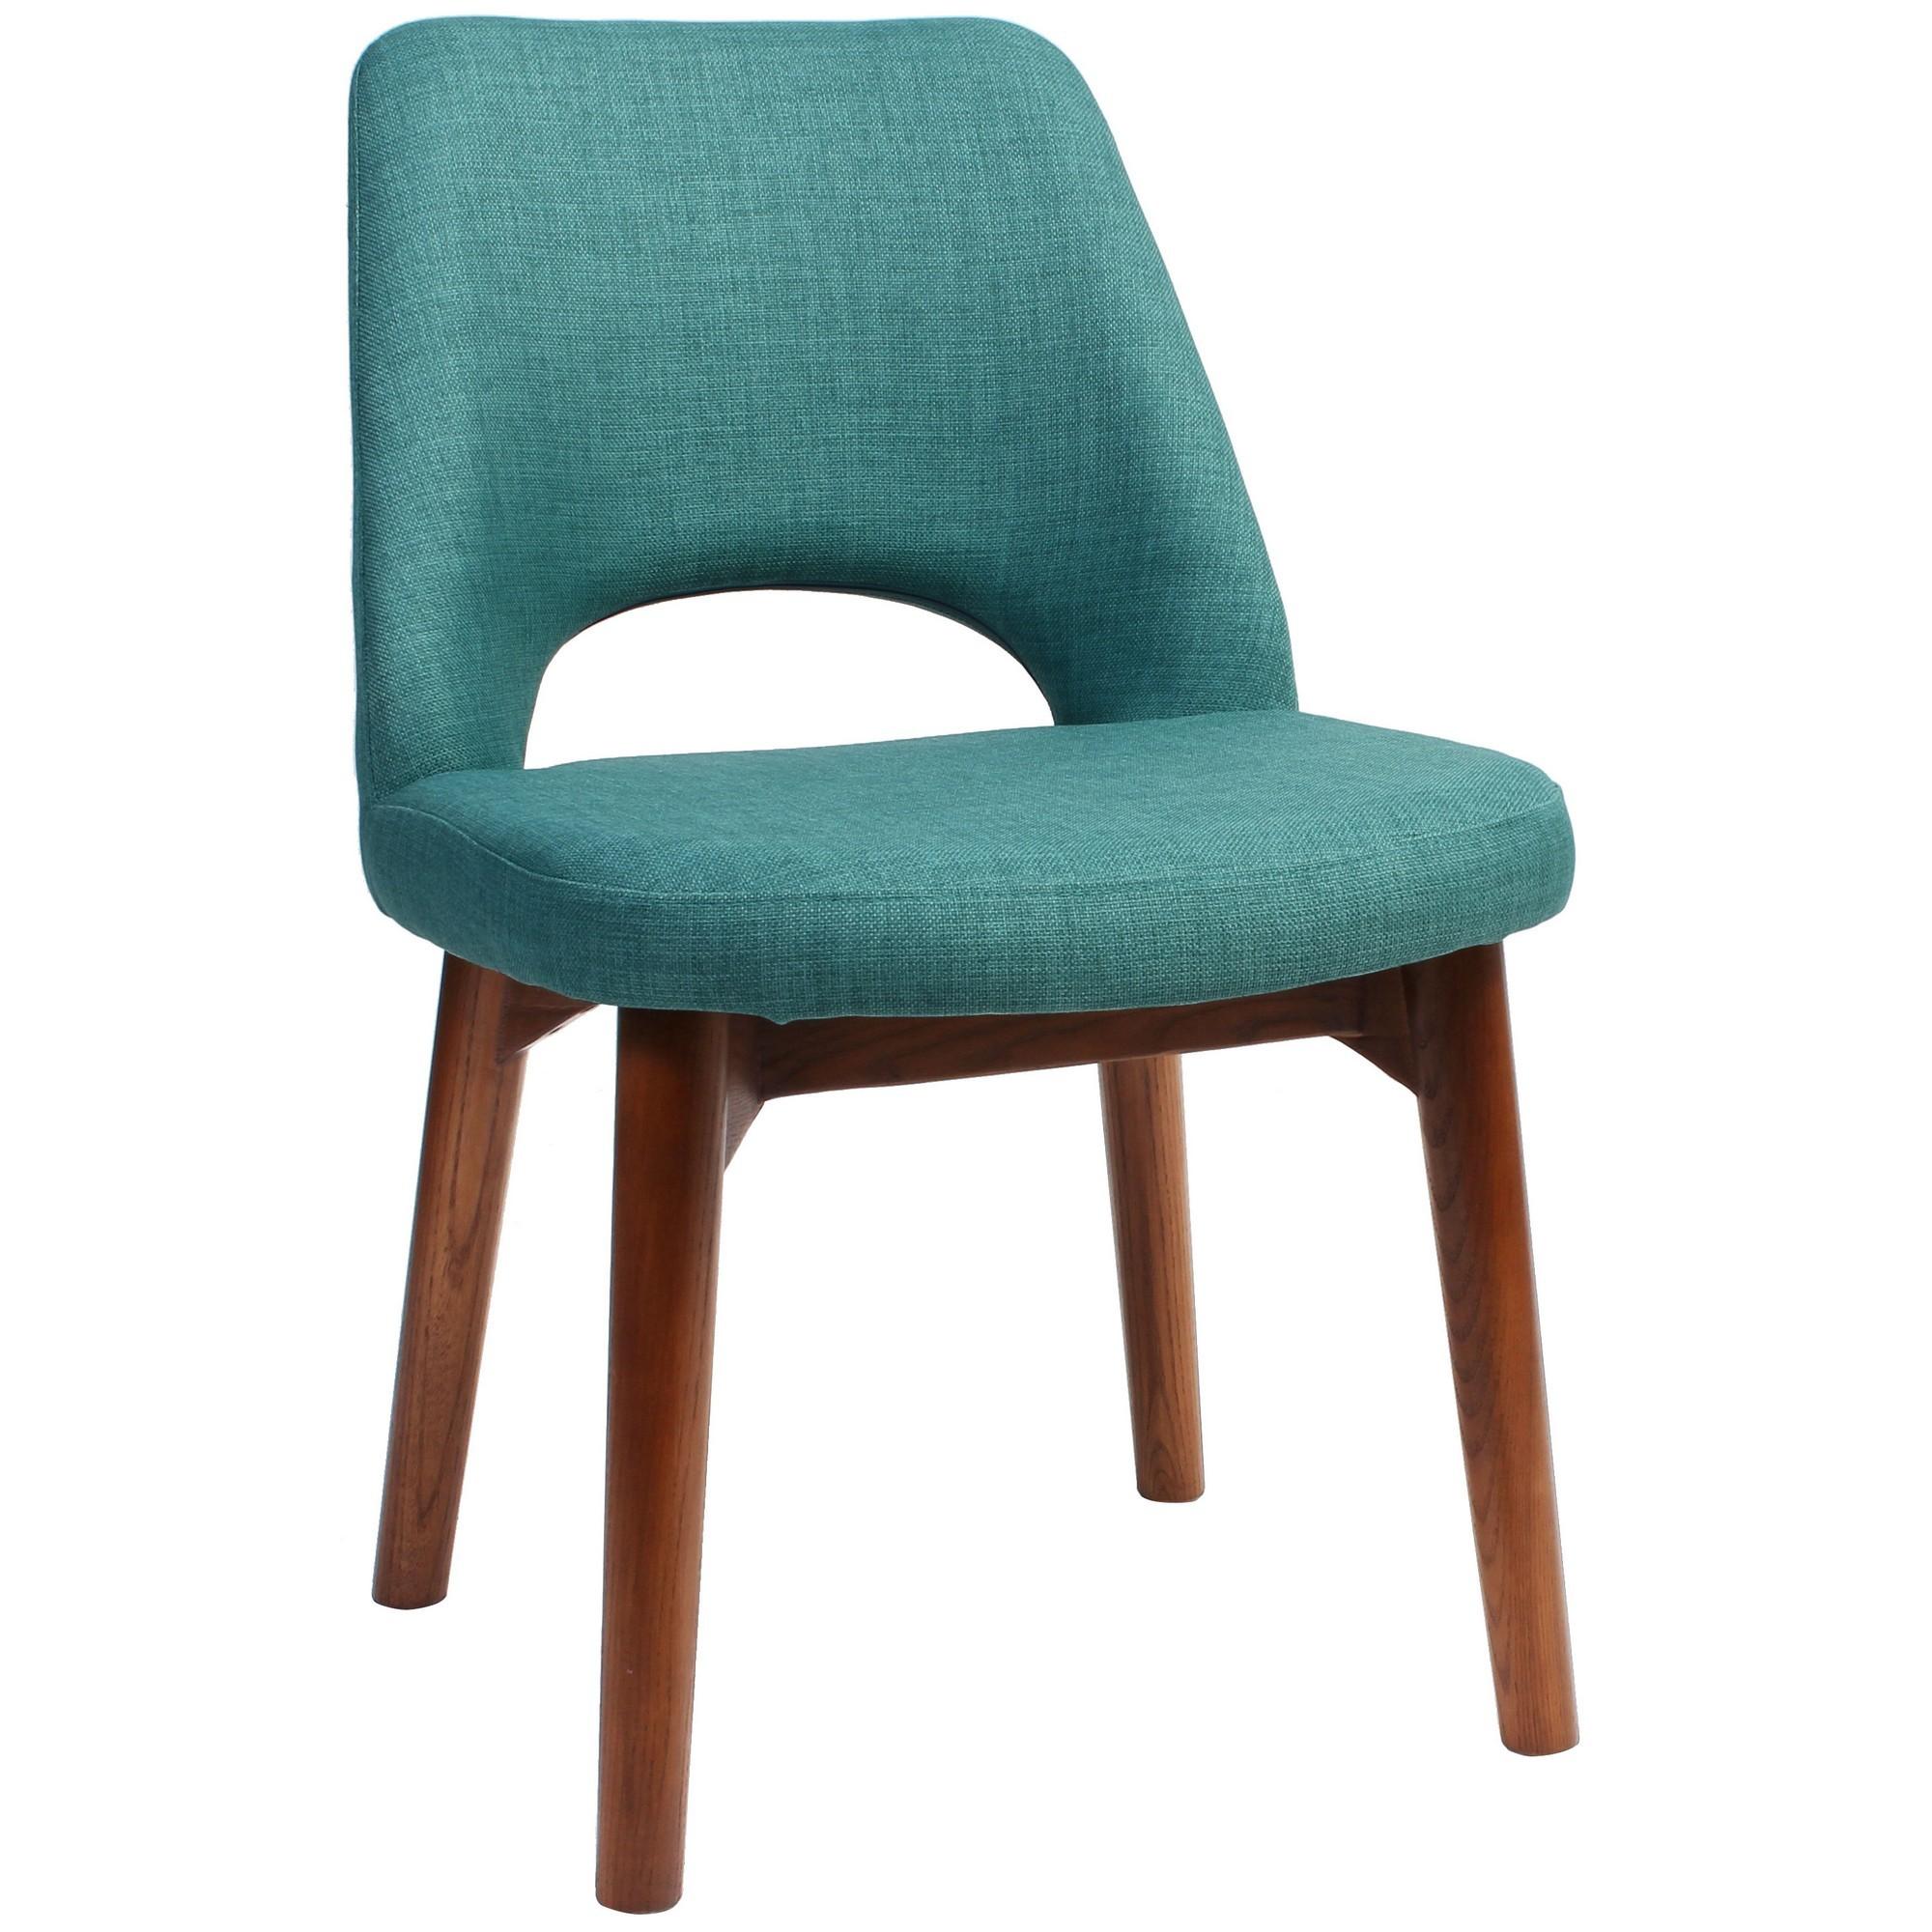 Albury Commercial Grade Fabric Dining Chair, Timber Leg, Teal / Light Walnut